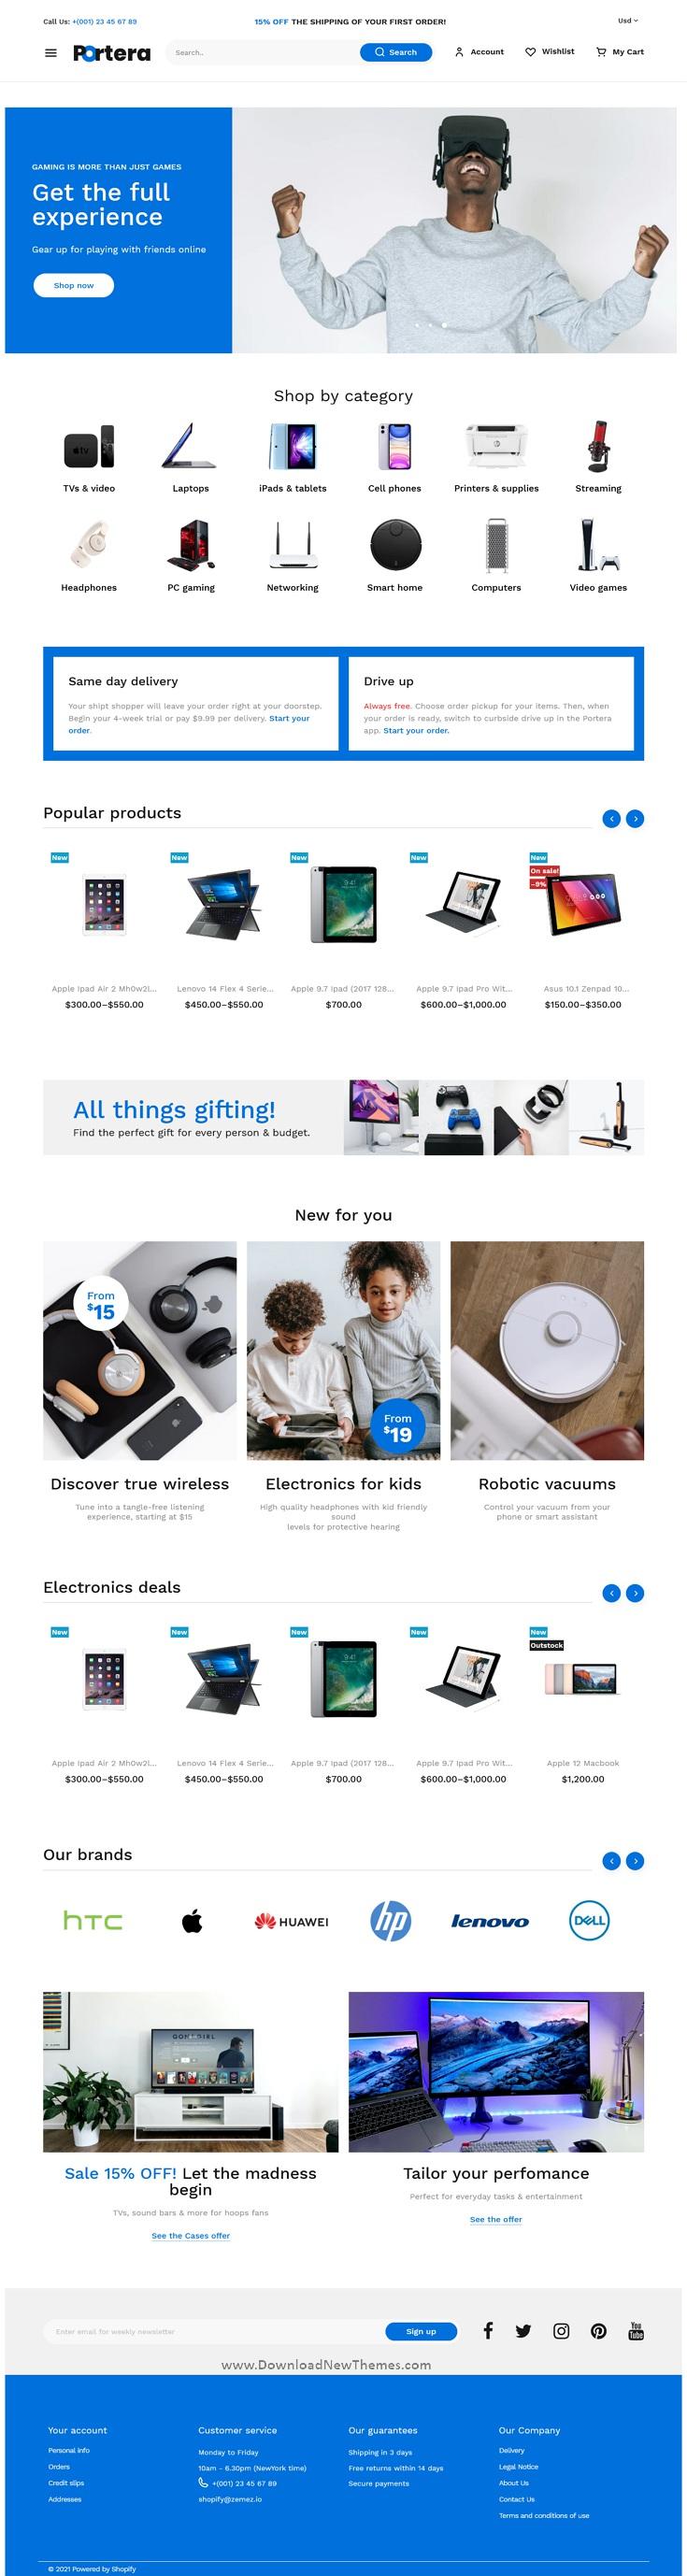 Portera - Minimal Shopify Theme for Dropshipping